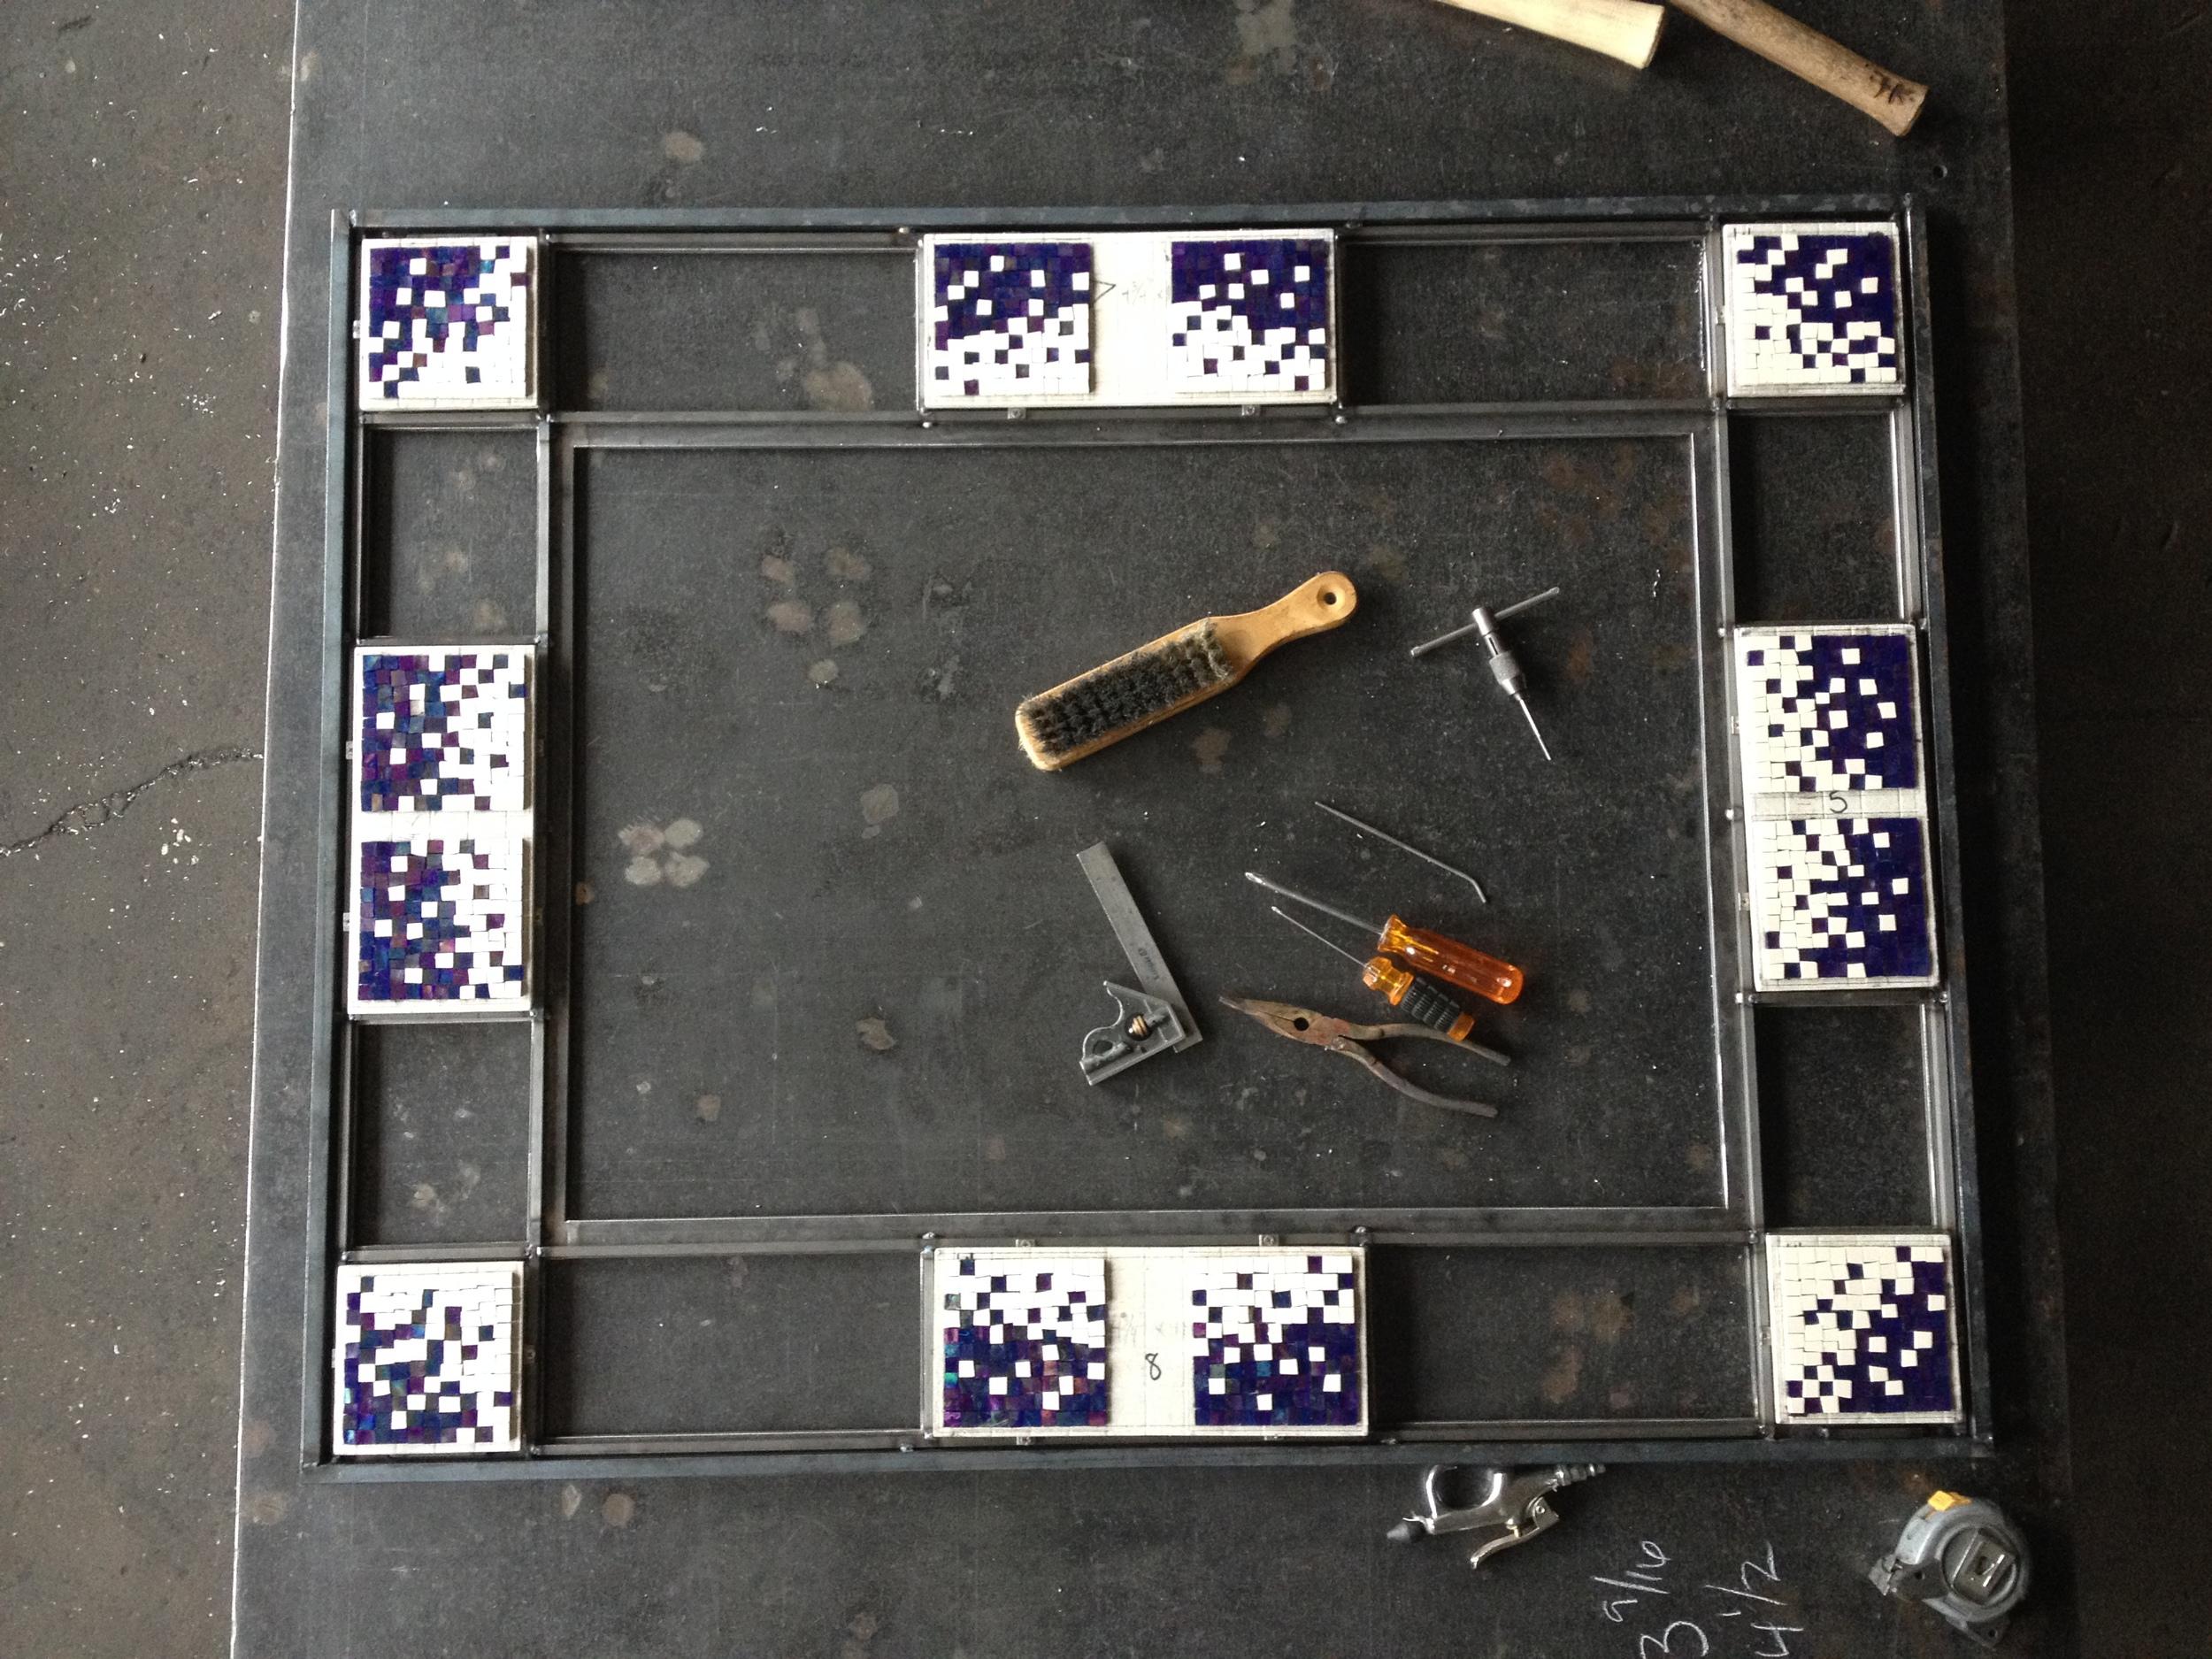 Custom mosaic firescreen in process